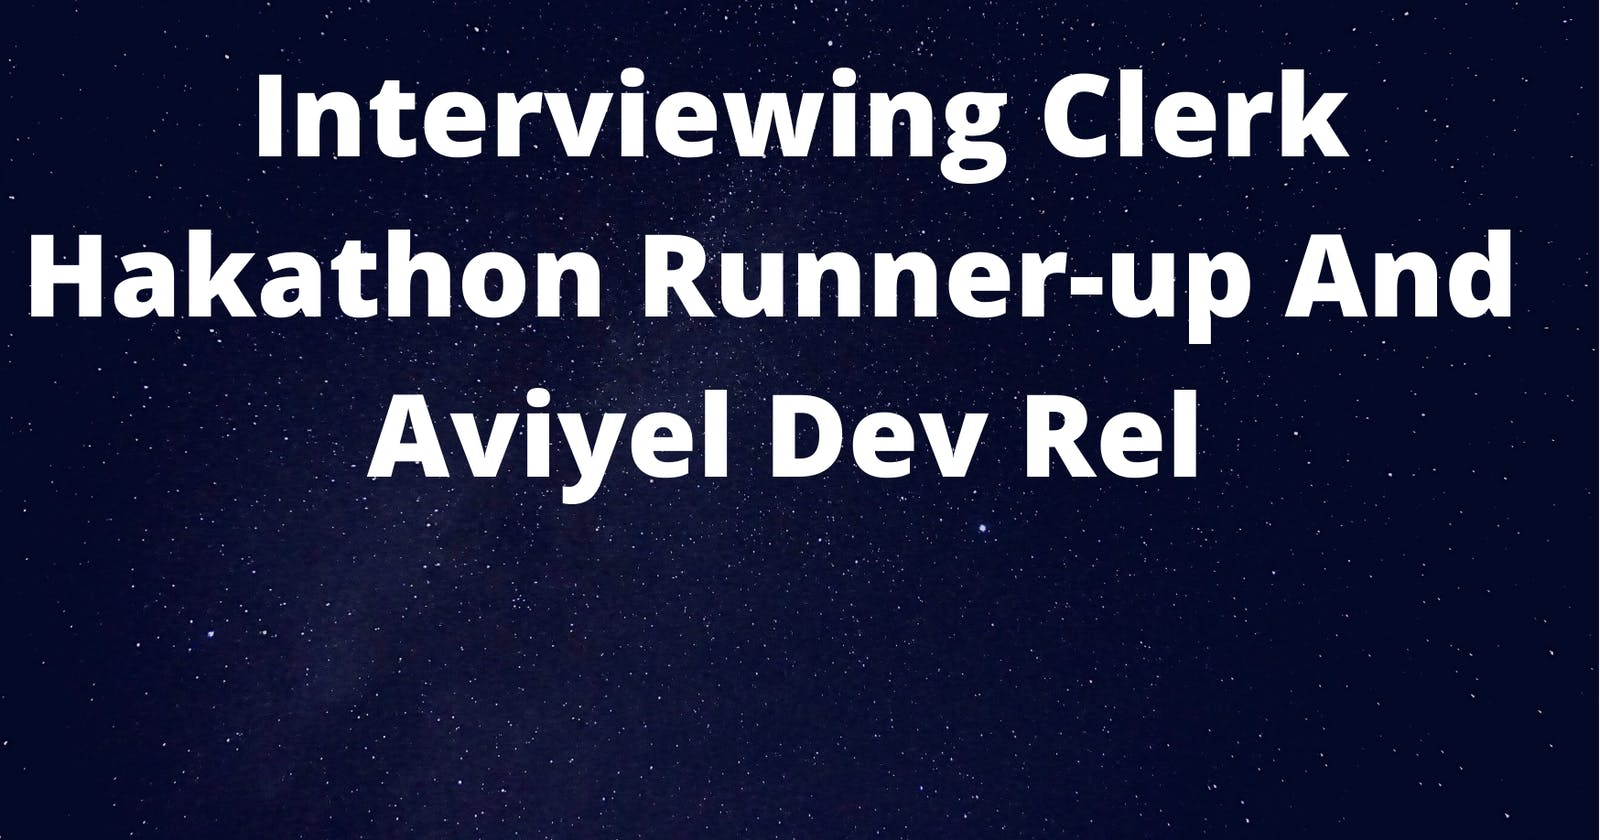 Interviewing Clerk Hakathon Runner-up And Aviyel Dev Rel